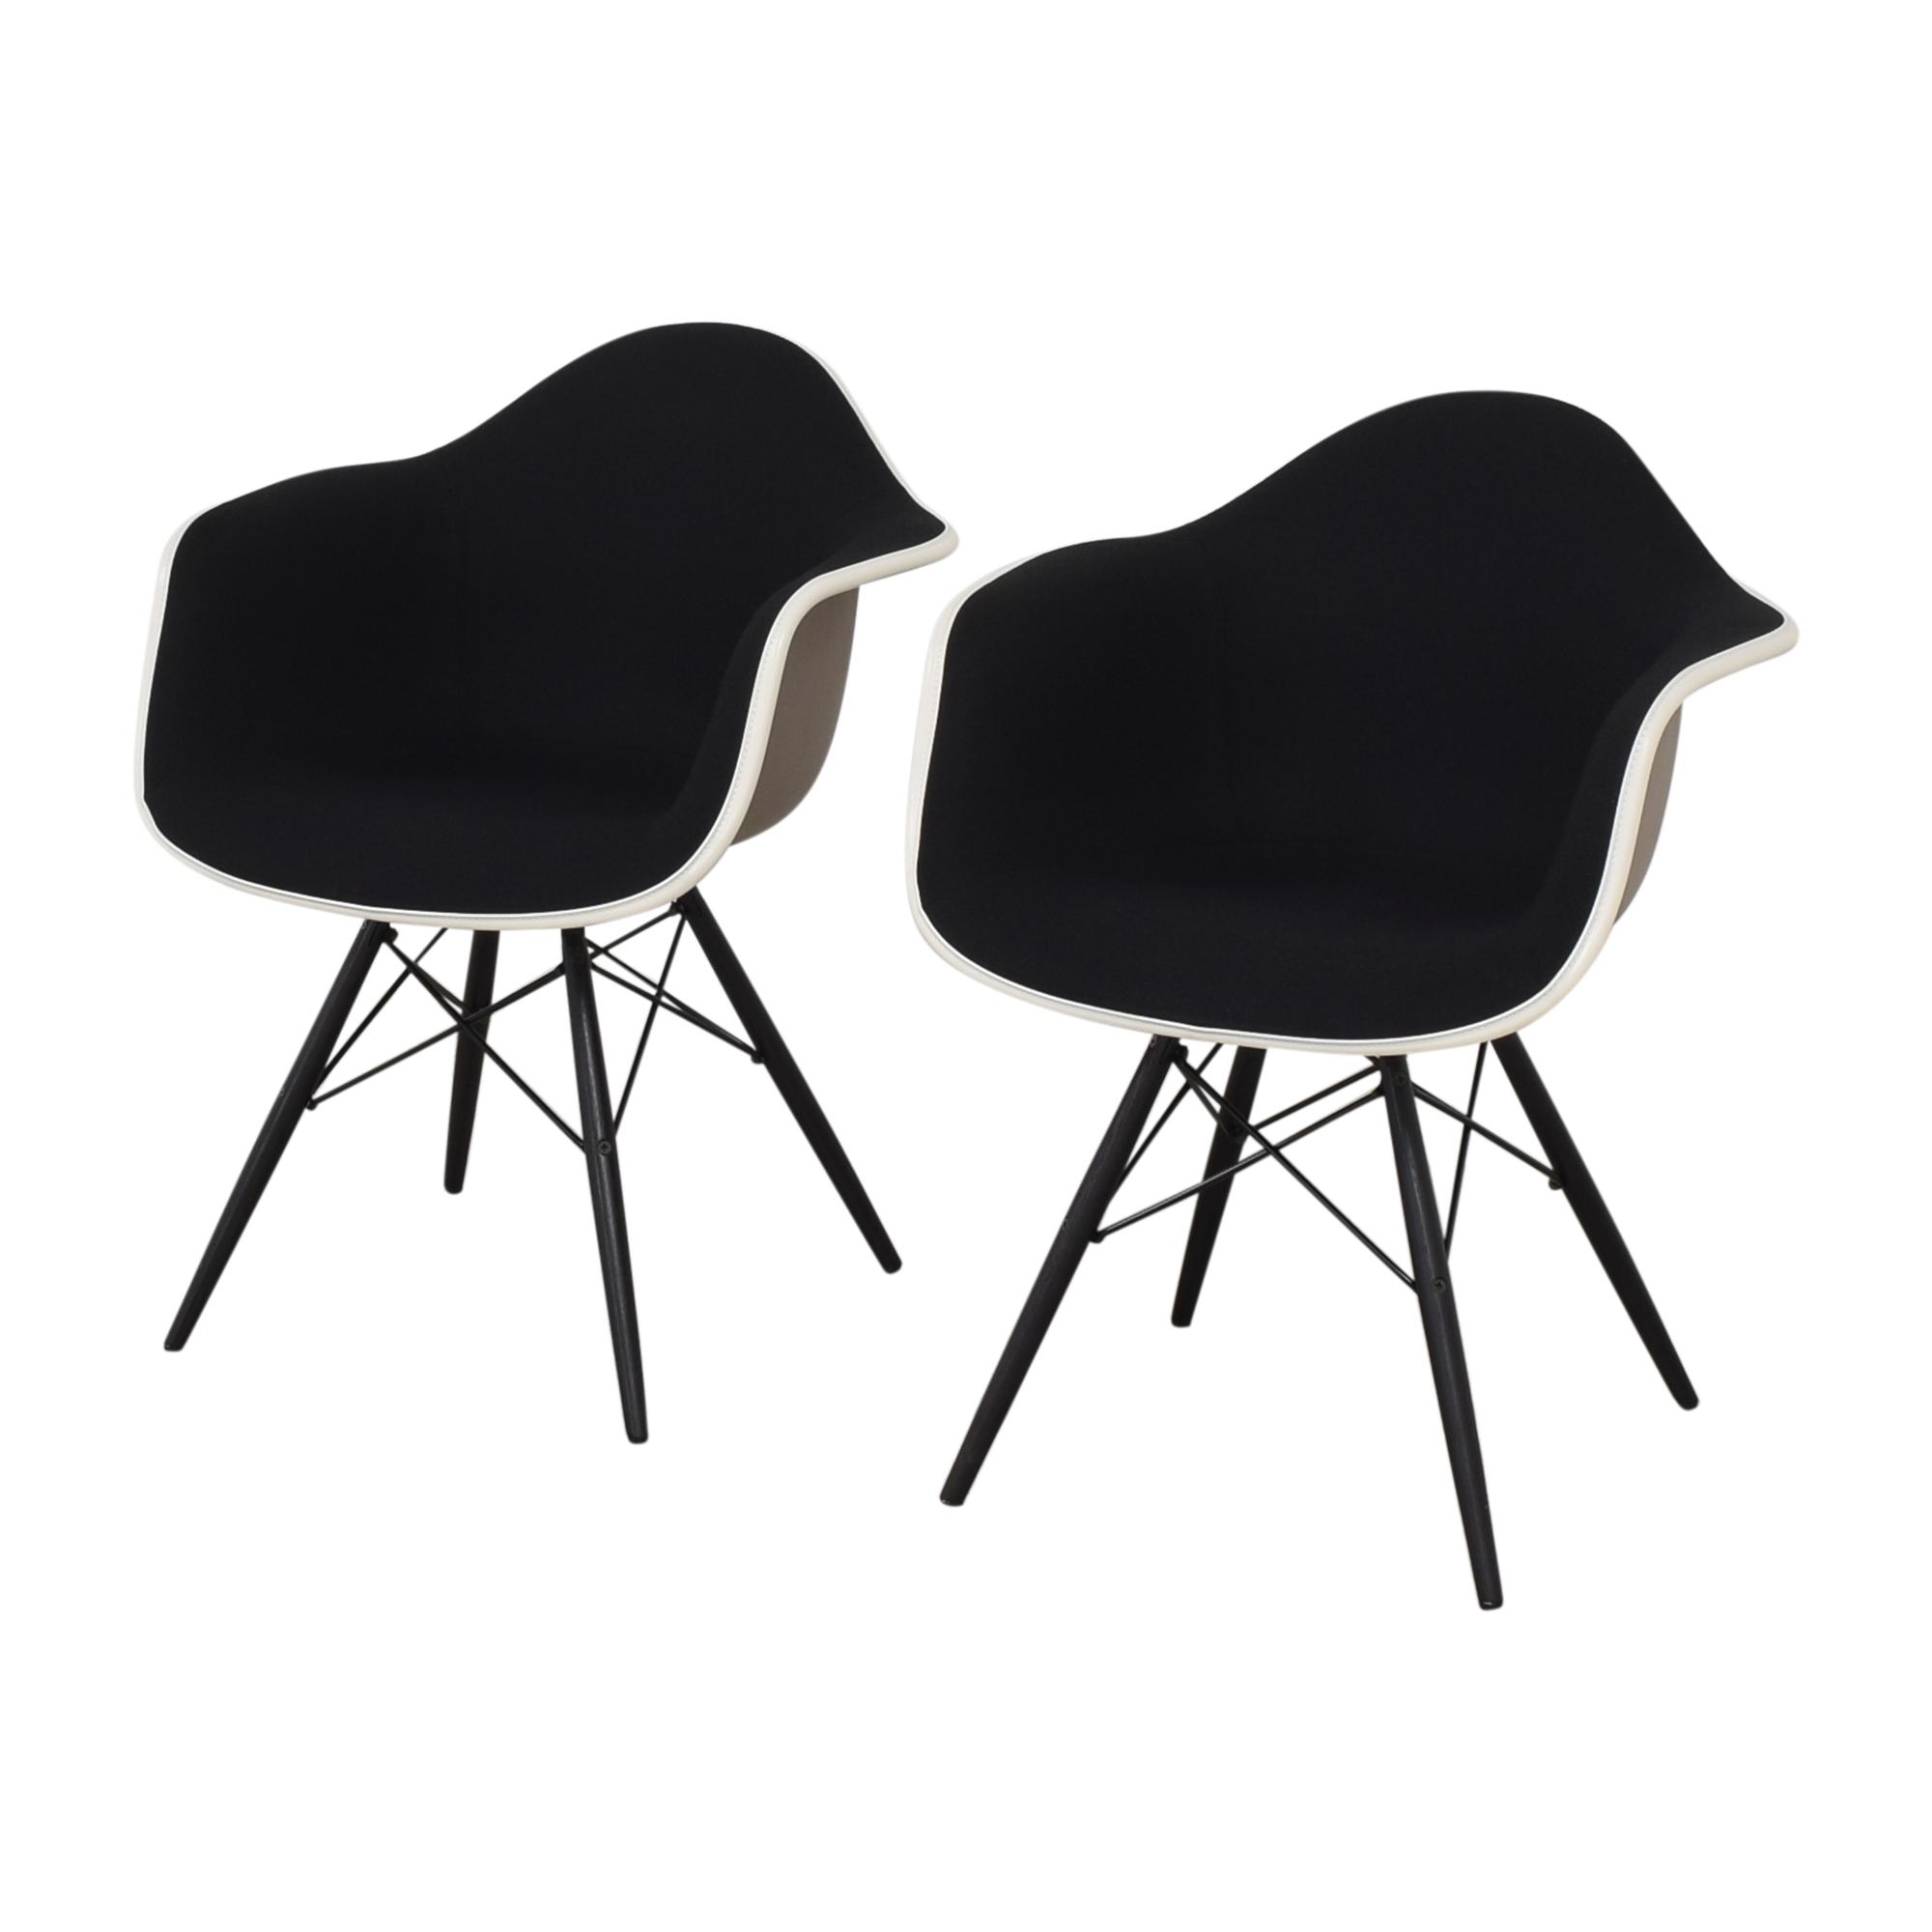 buy Herman Miller Eames Molded Arm Chairs Herman Miller Chairs